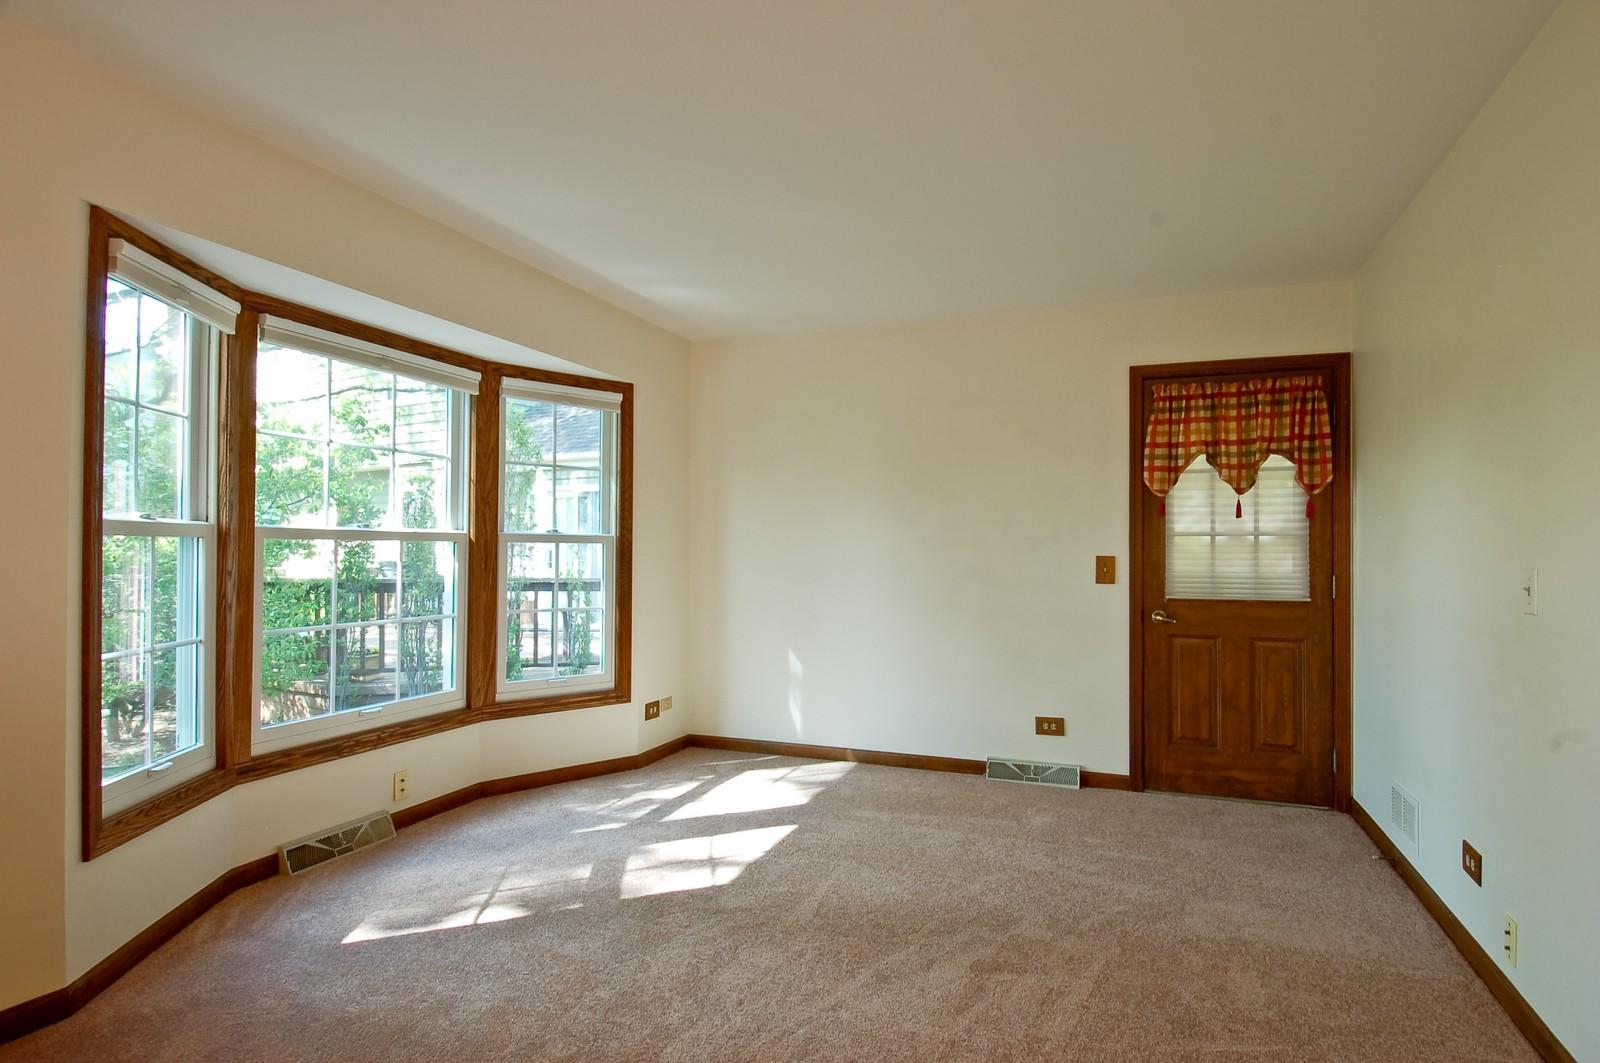 Real Estate Photography - 27W371 Churchill, Winfield, IL, 60190 - Location 1